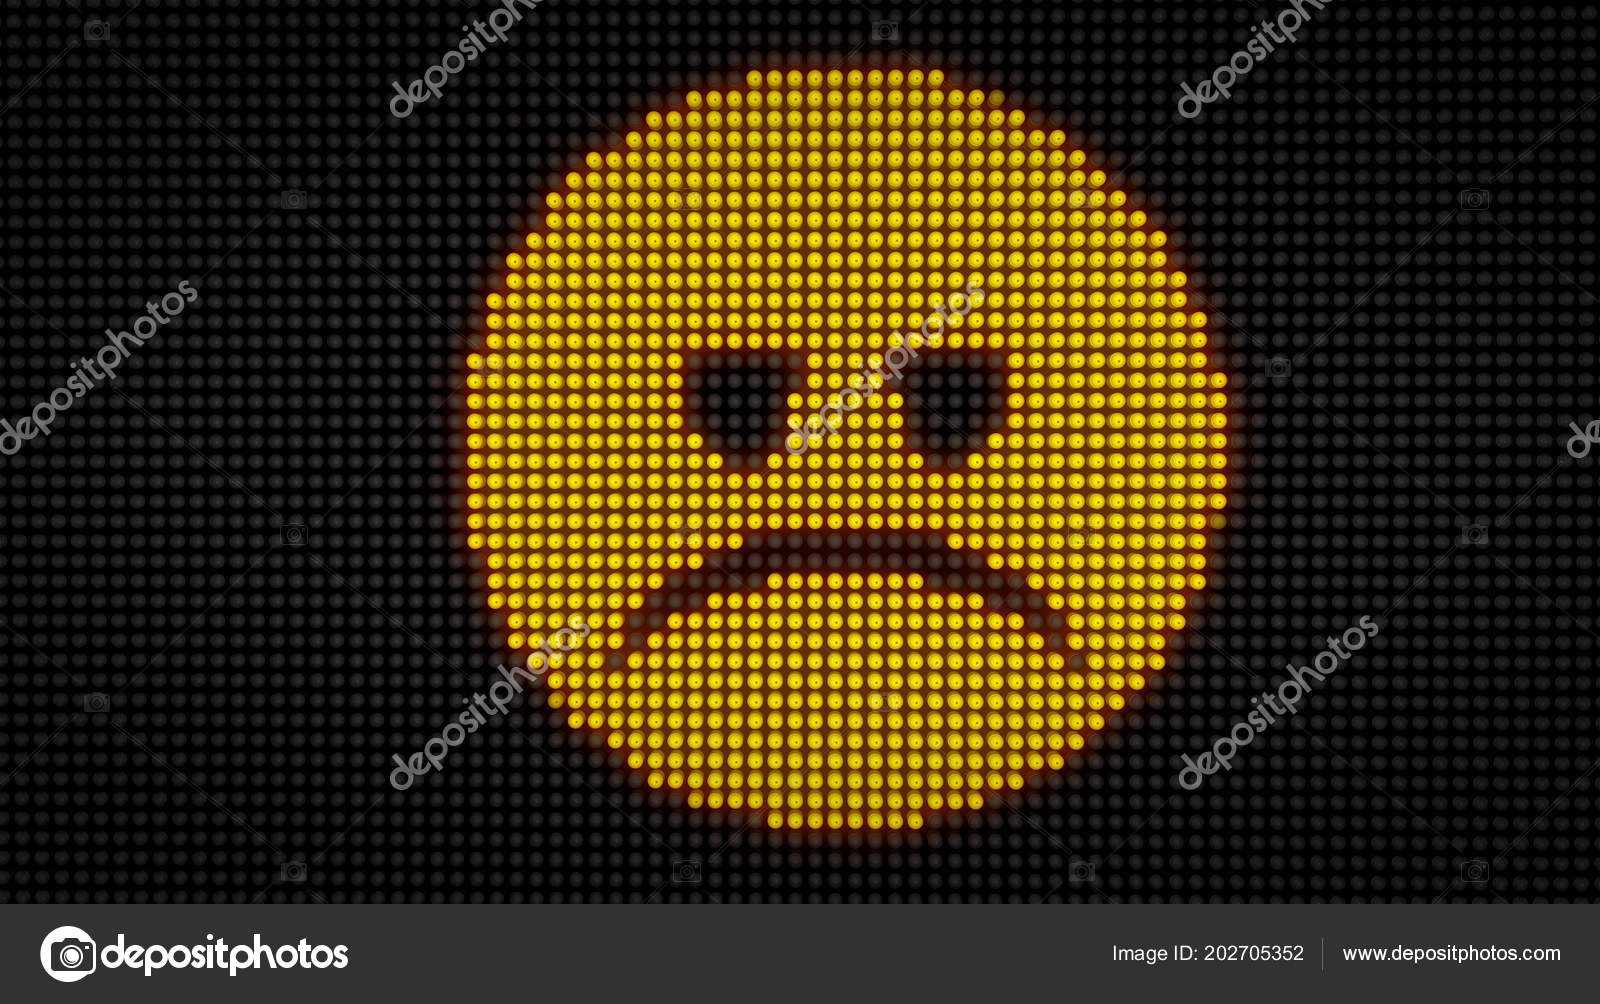 Emoticon Sad Face Big Led Display Large Pixels Bright Light Stock